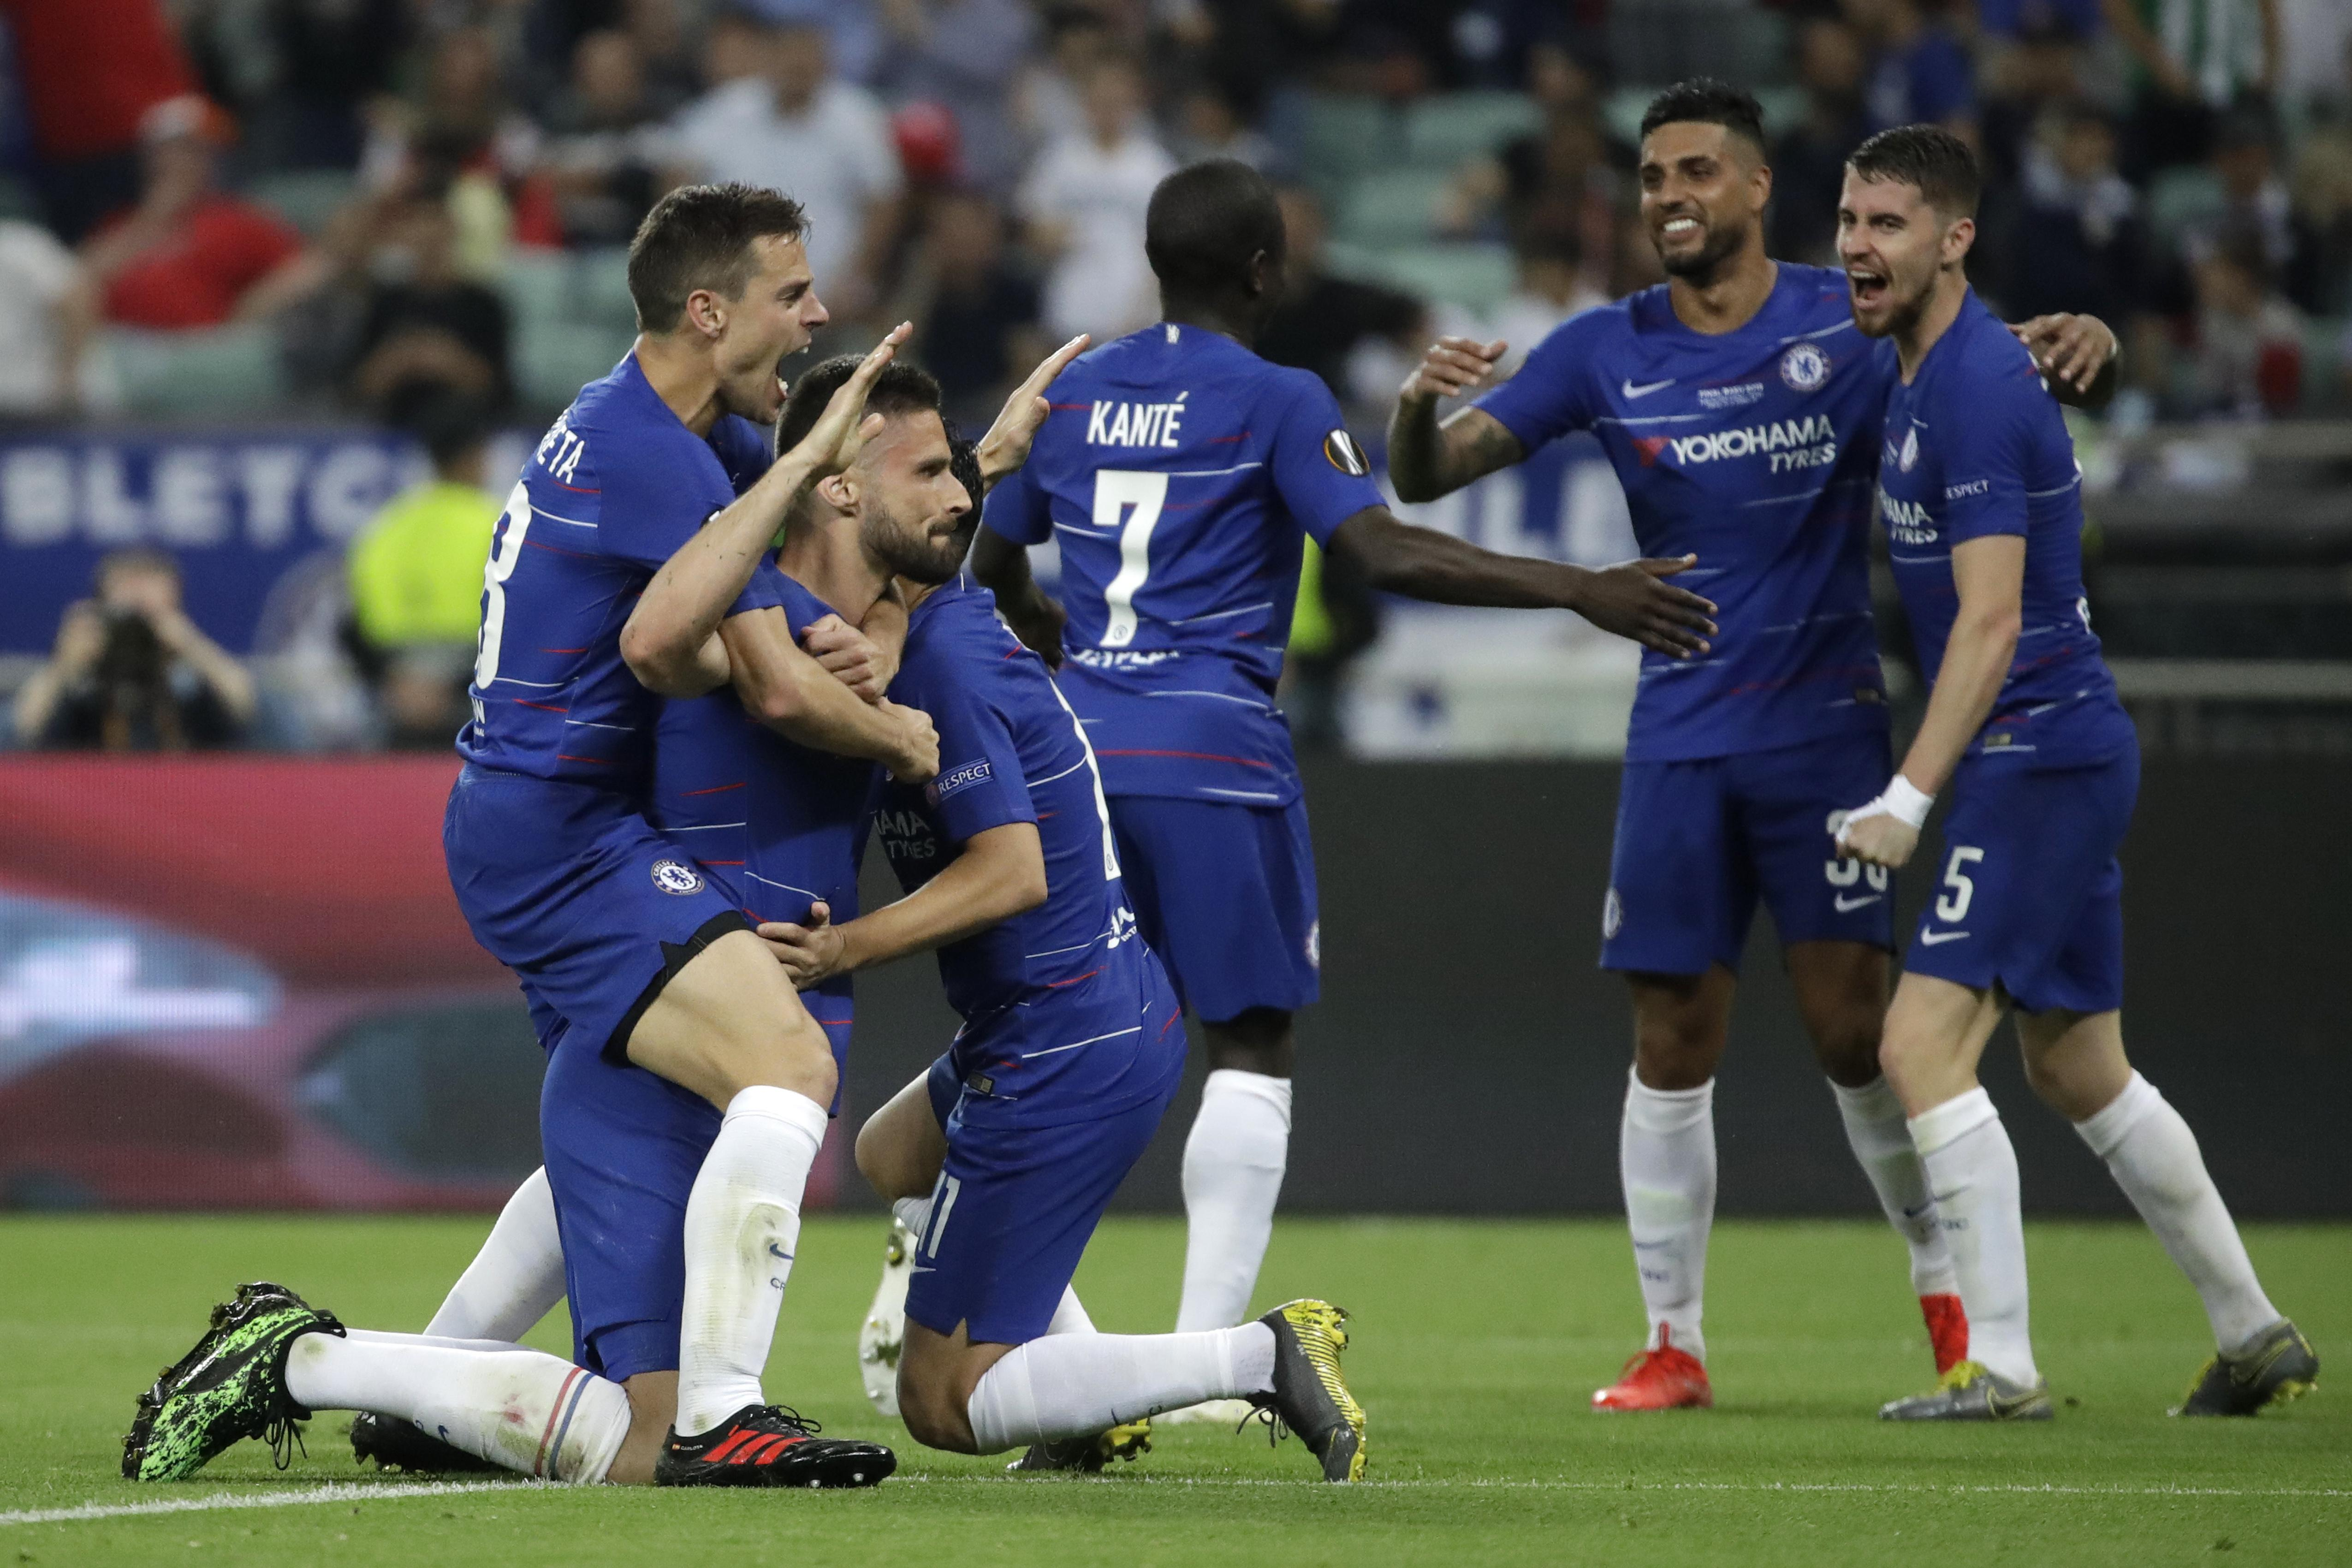 fe7dd058913 Eden Hazard scores 2 as Chelsea beats Arsenal 4-1 in Europa League ...